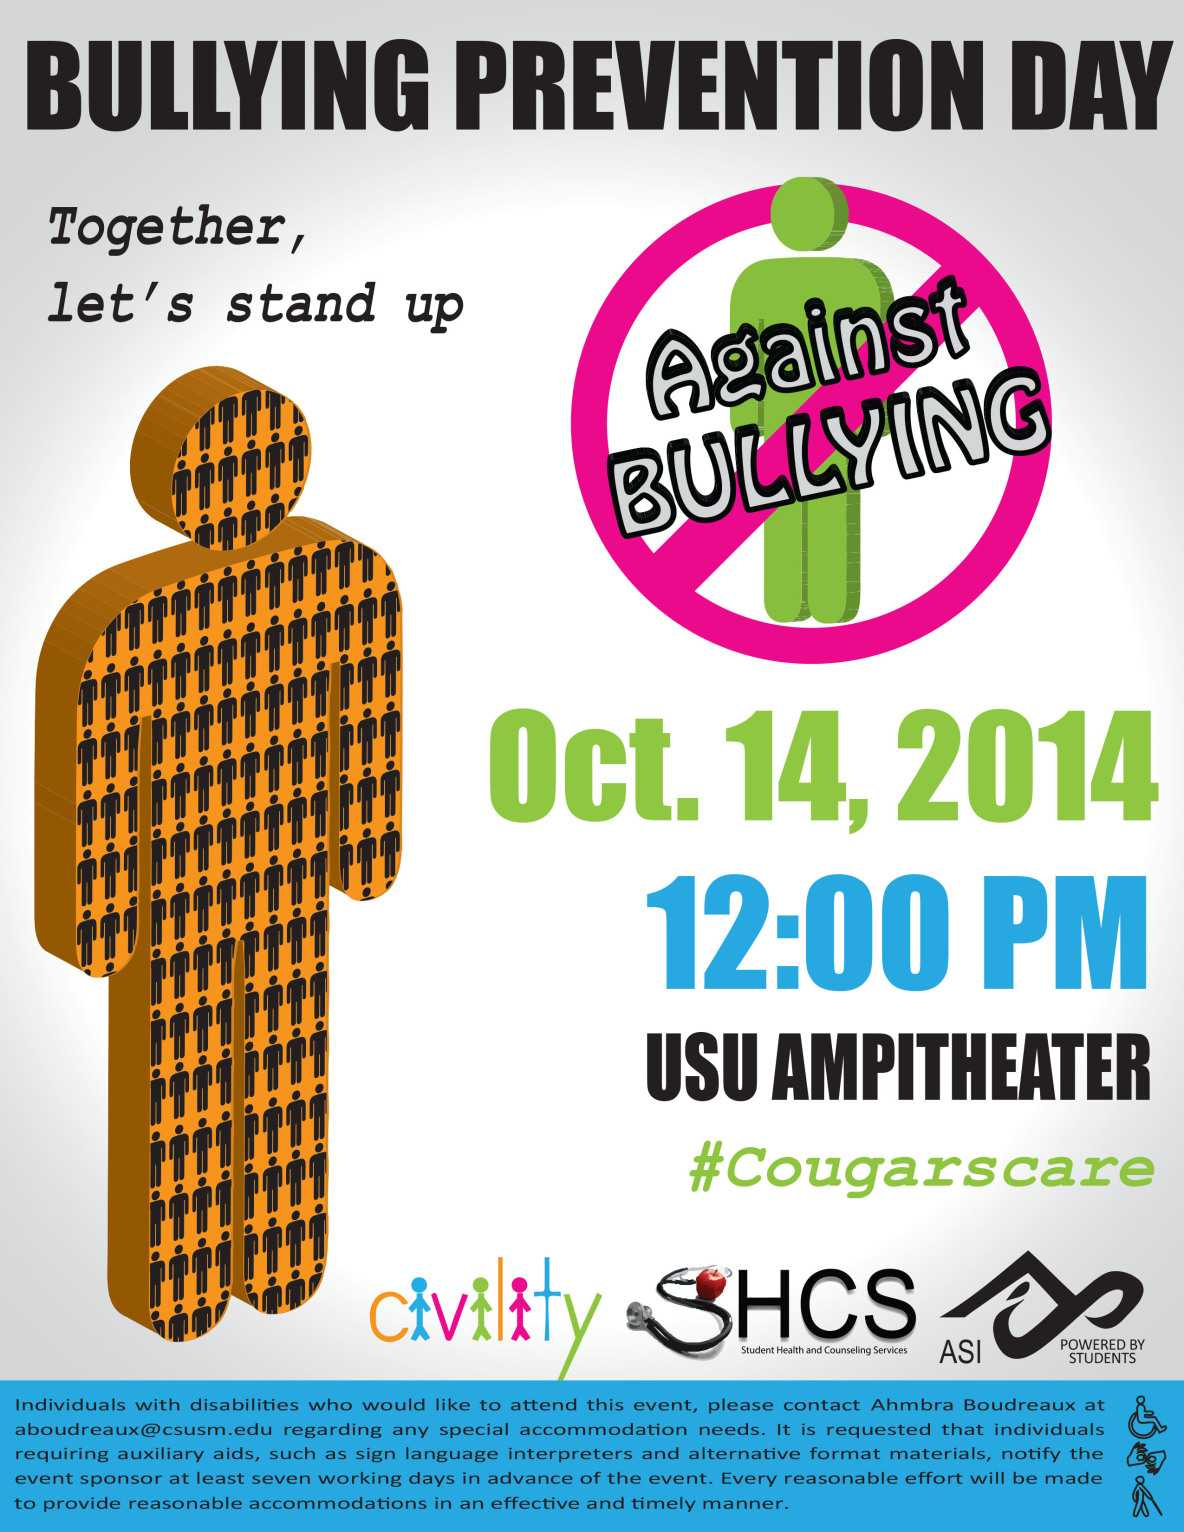 Bullying Prevention Day